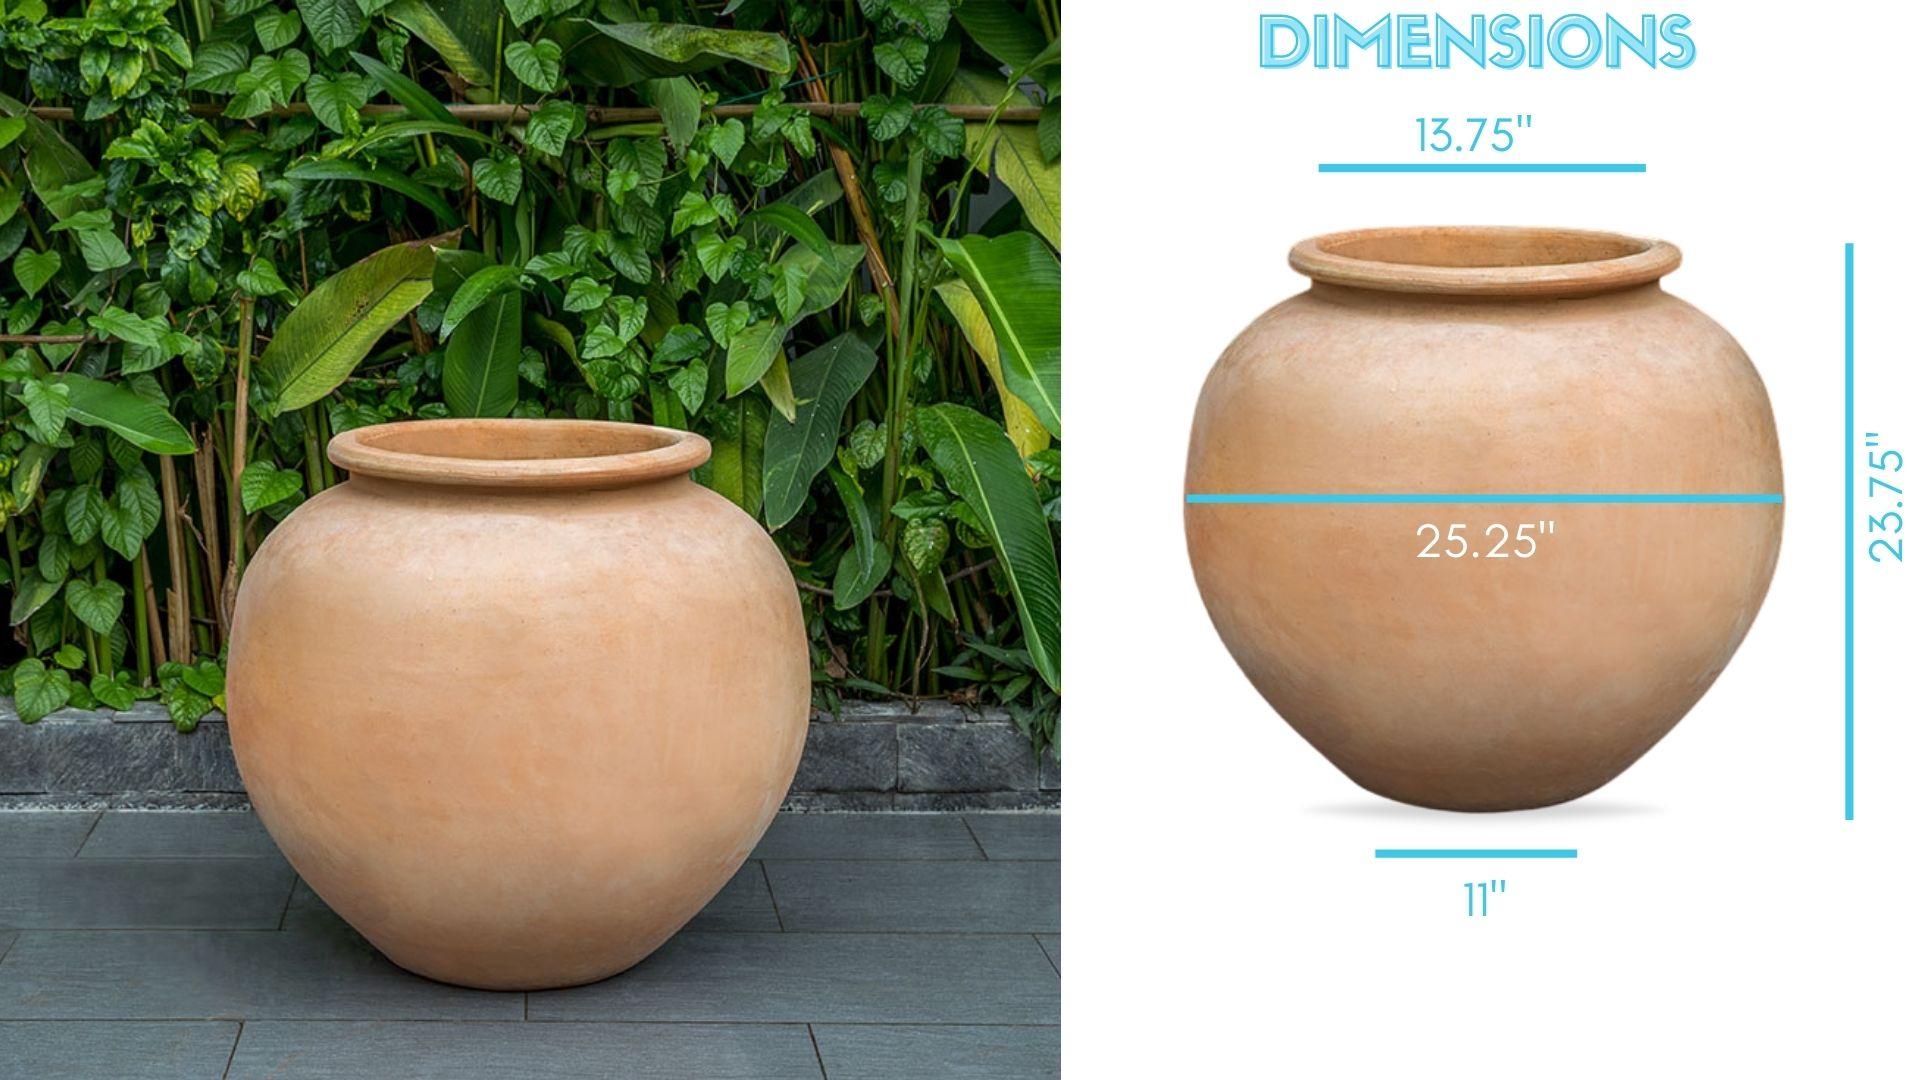 devesian-jar-dimensions